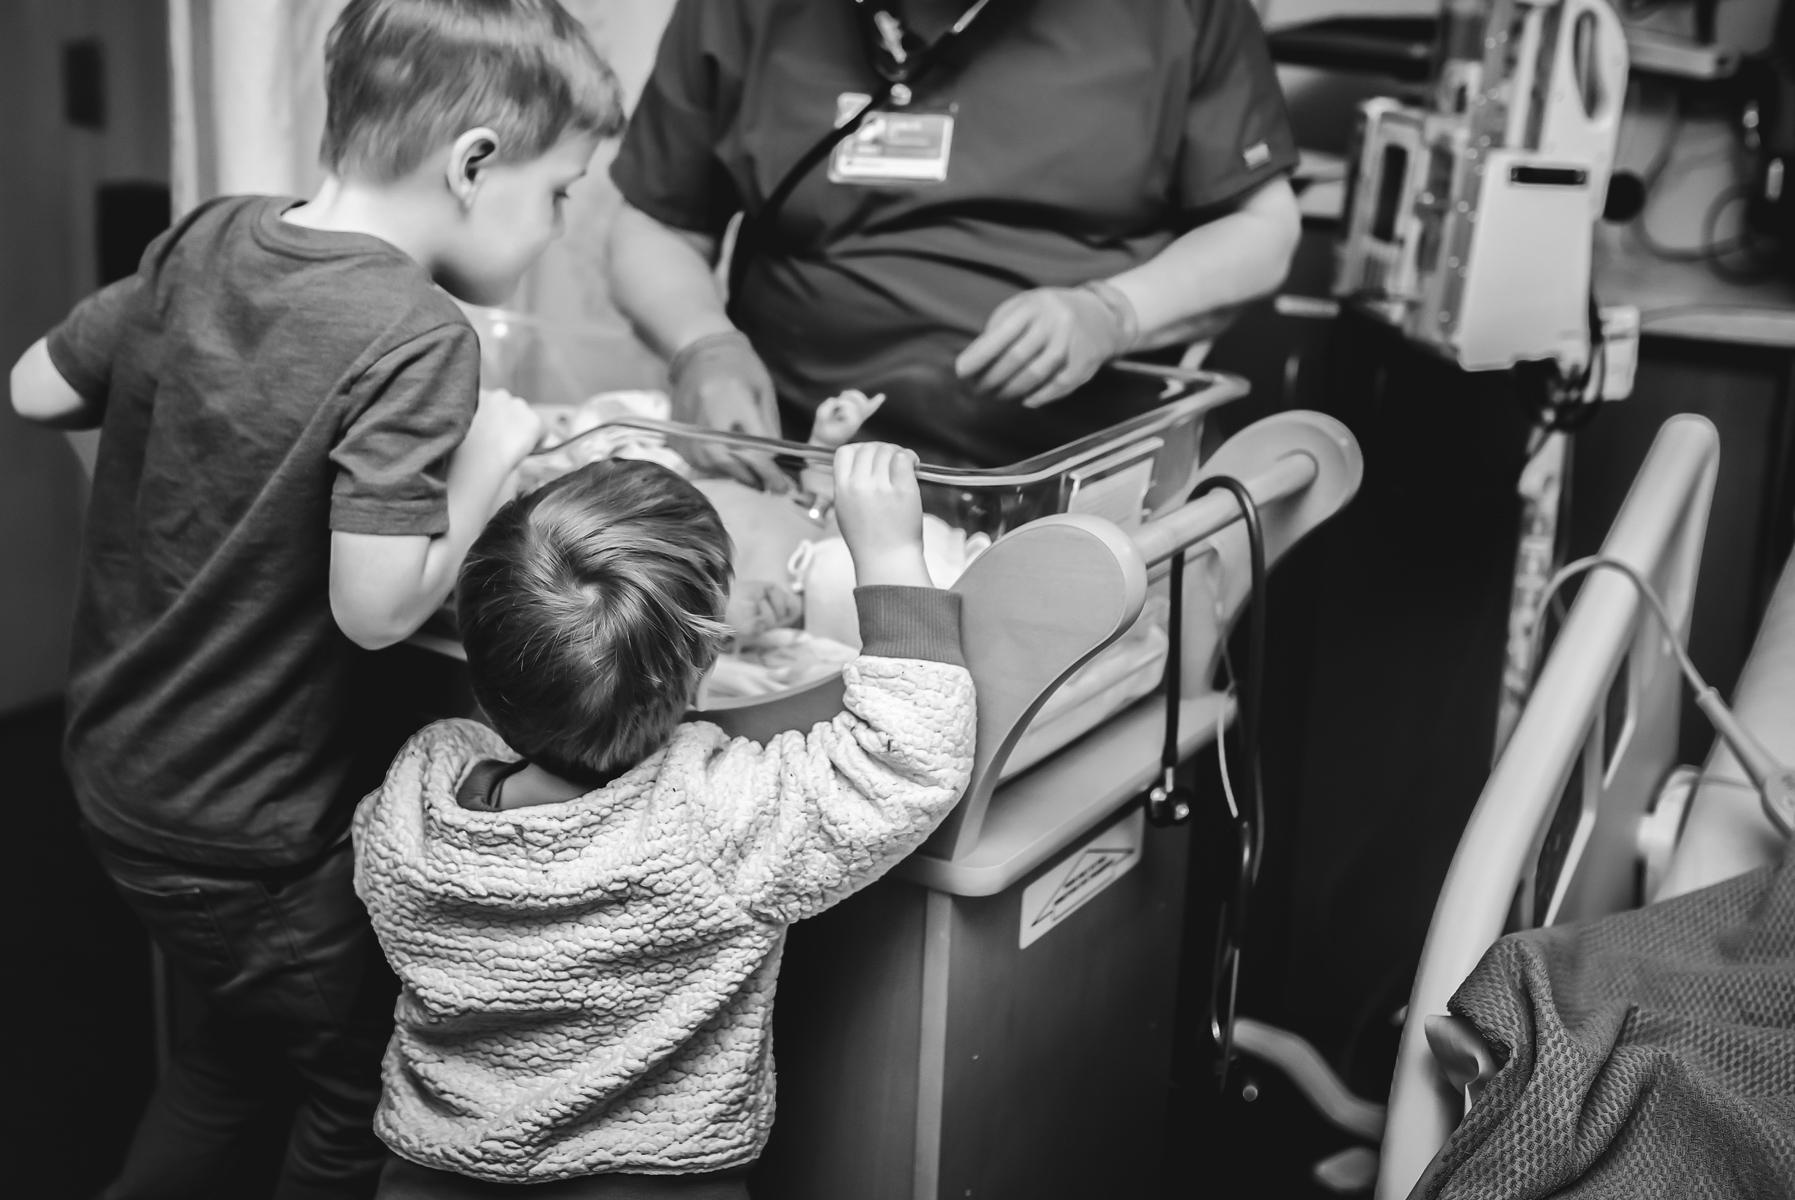 denver-cesarean-birth-photography-brothers